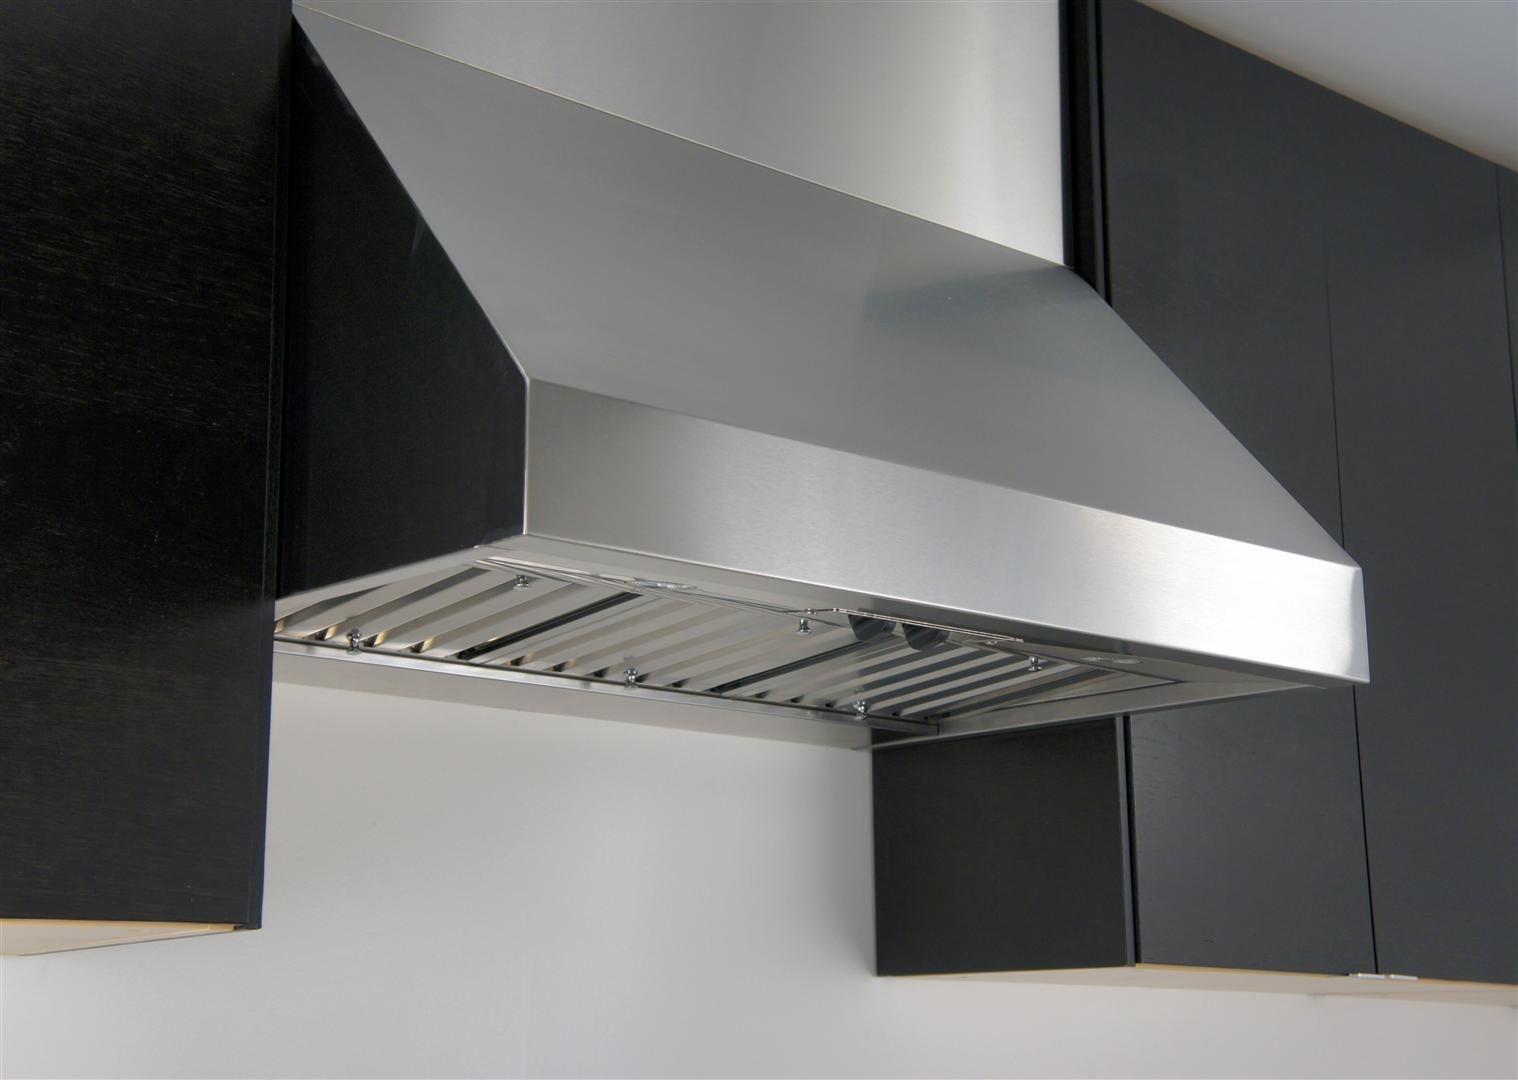 Yale Appliance Lighting Boston Kitchen Appliances Showroom Ventilation Hood Gas Range Review Range Hood